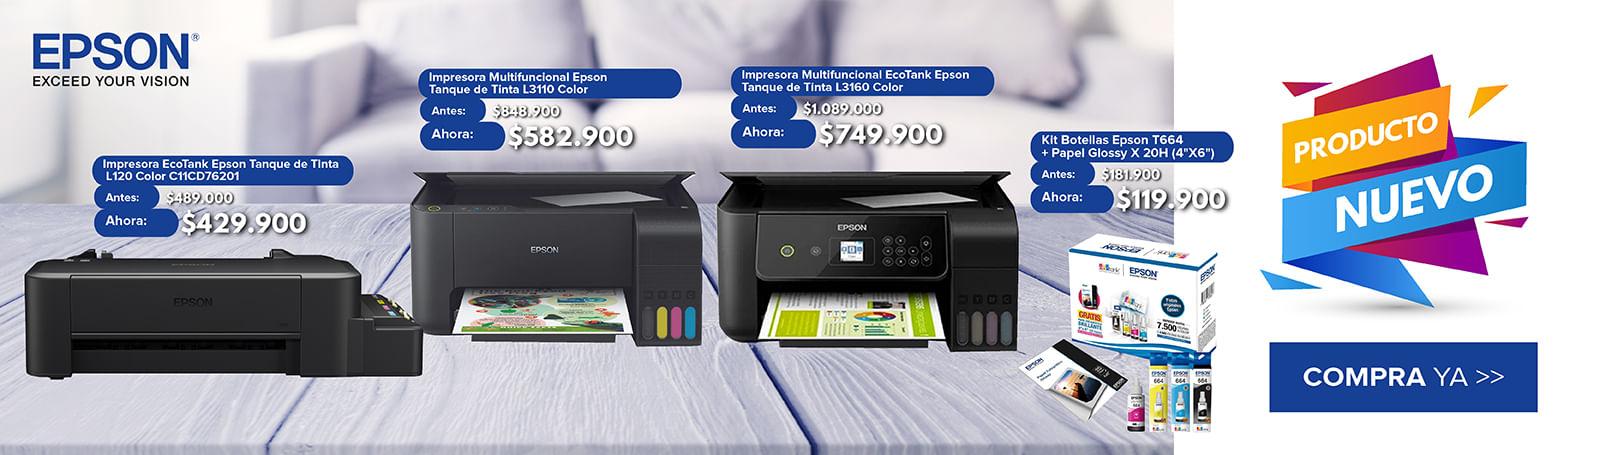 Epson-Impresoras